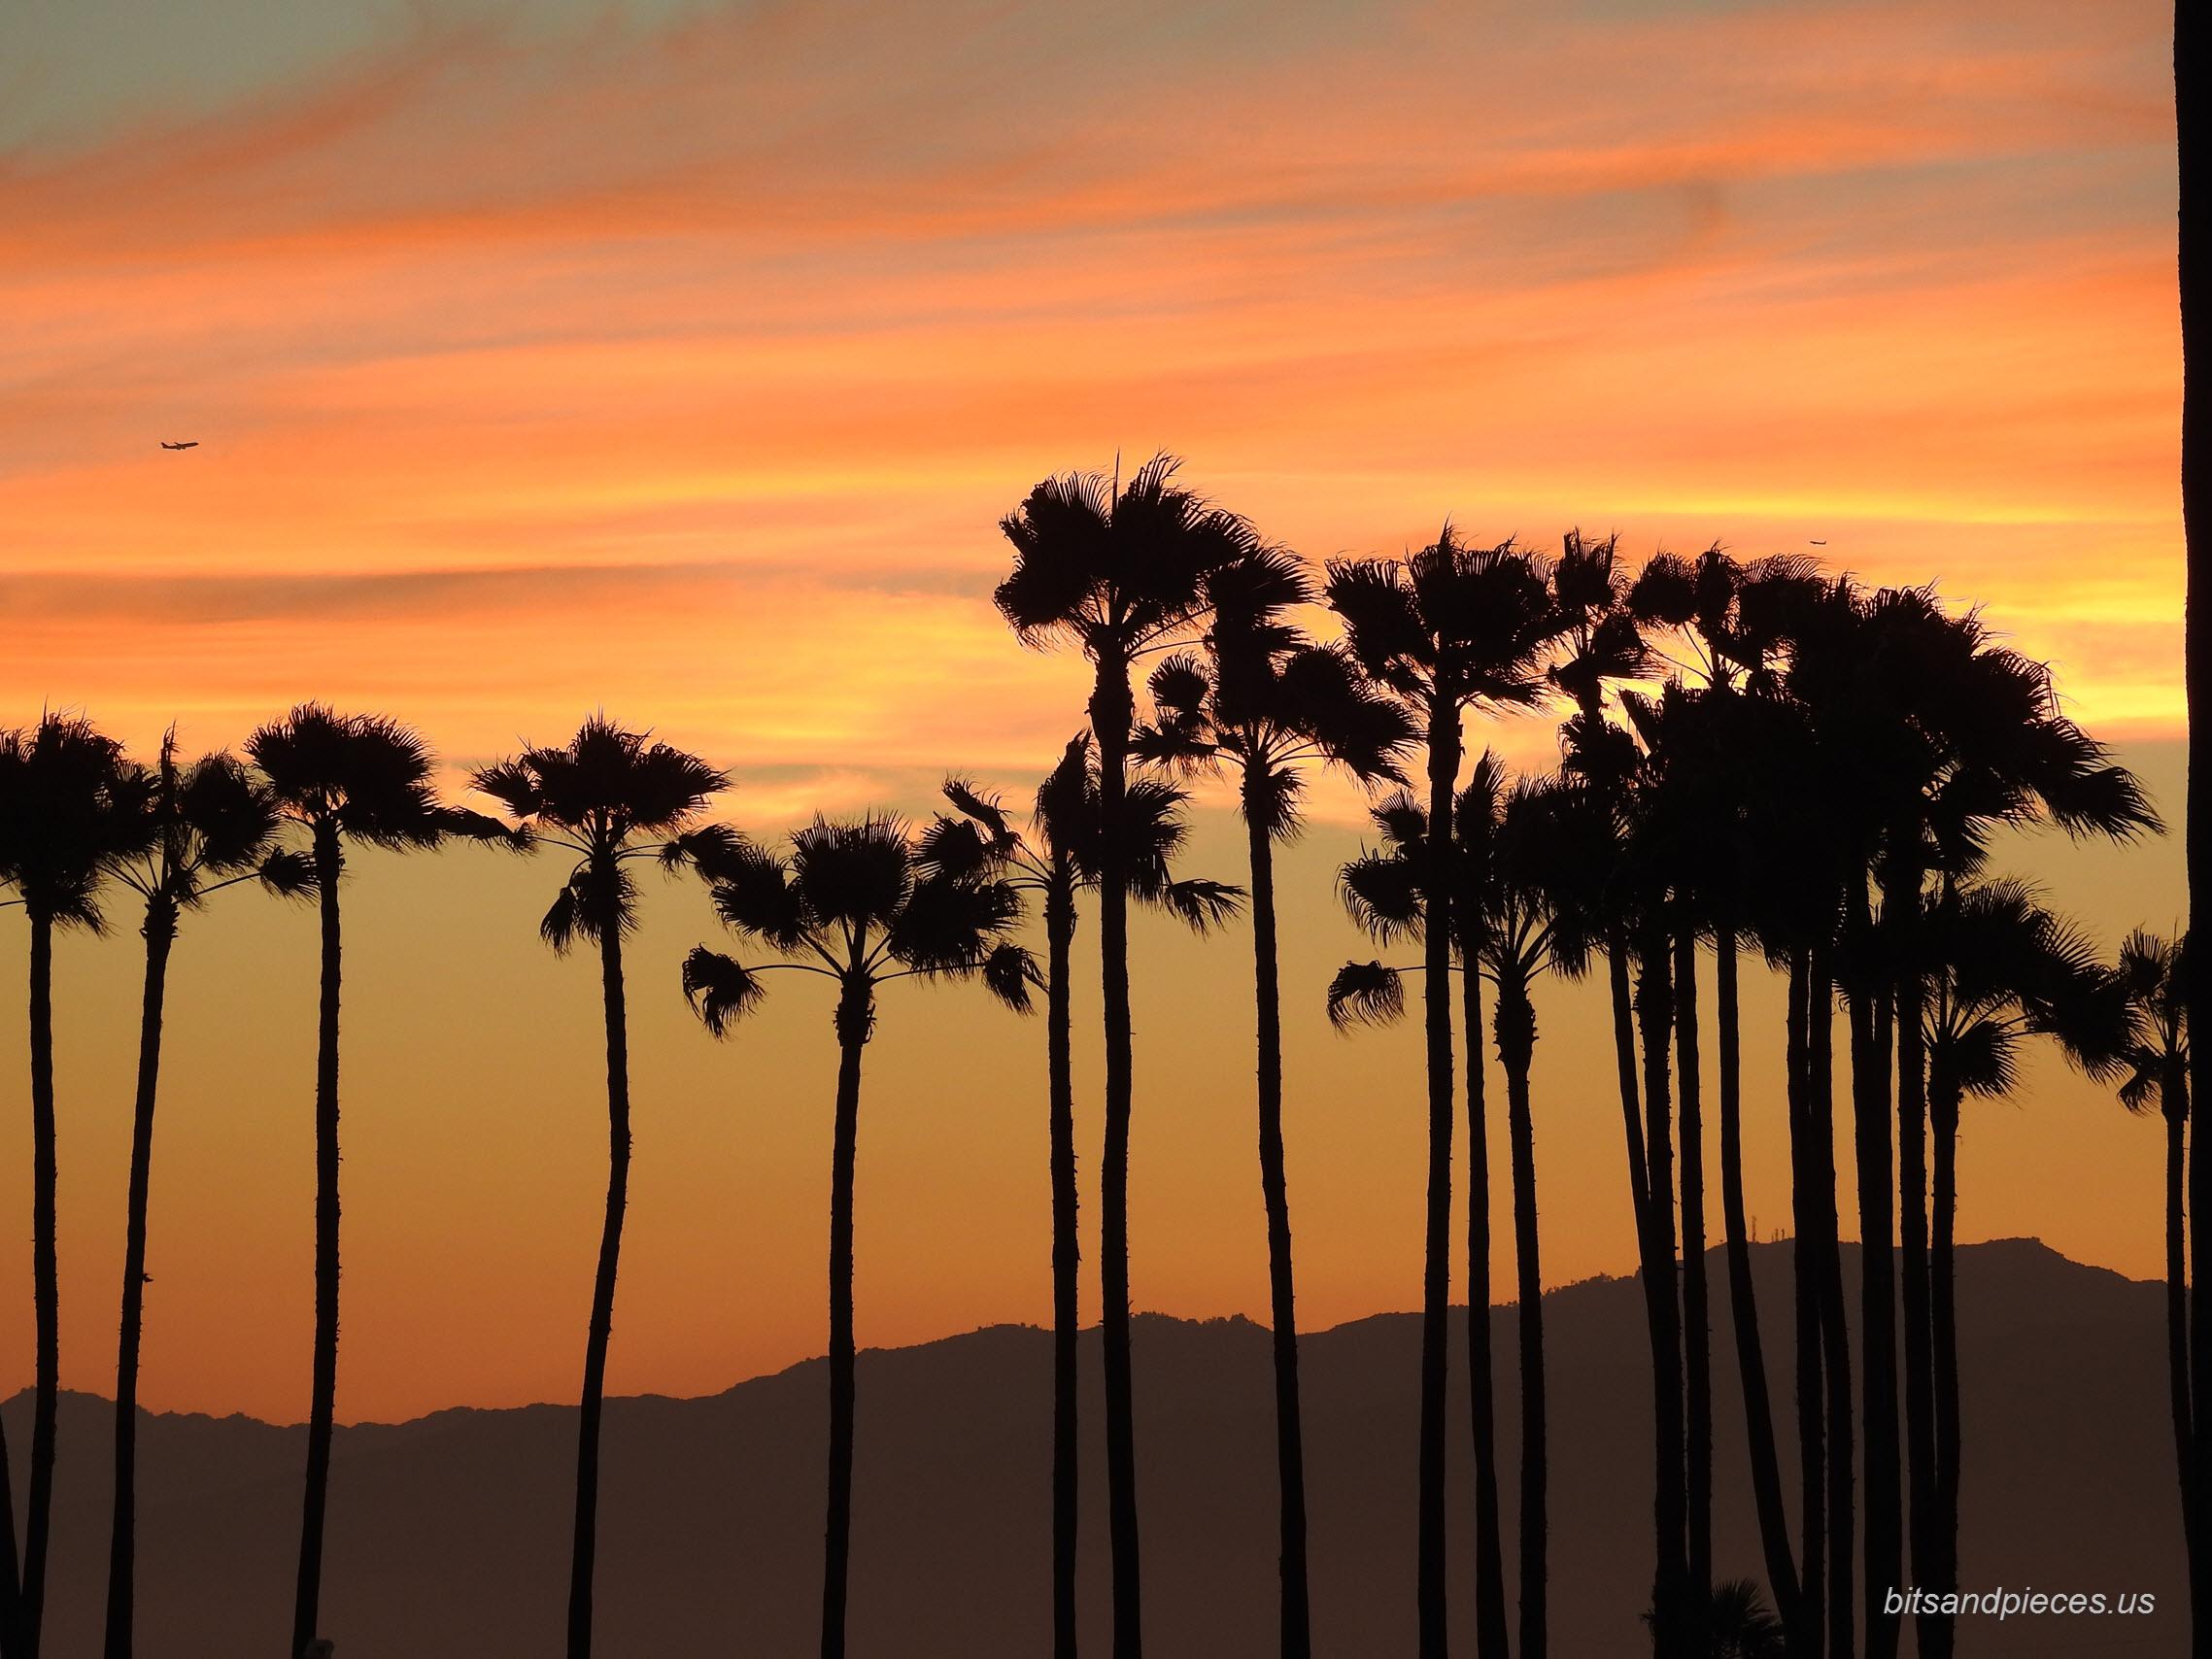 venice at sunset - photo #40